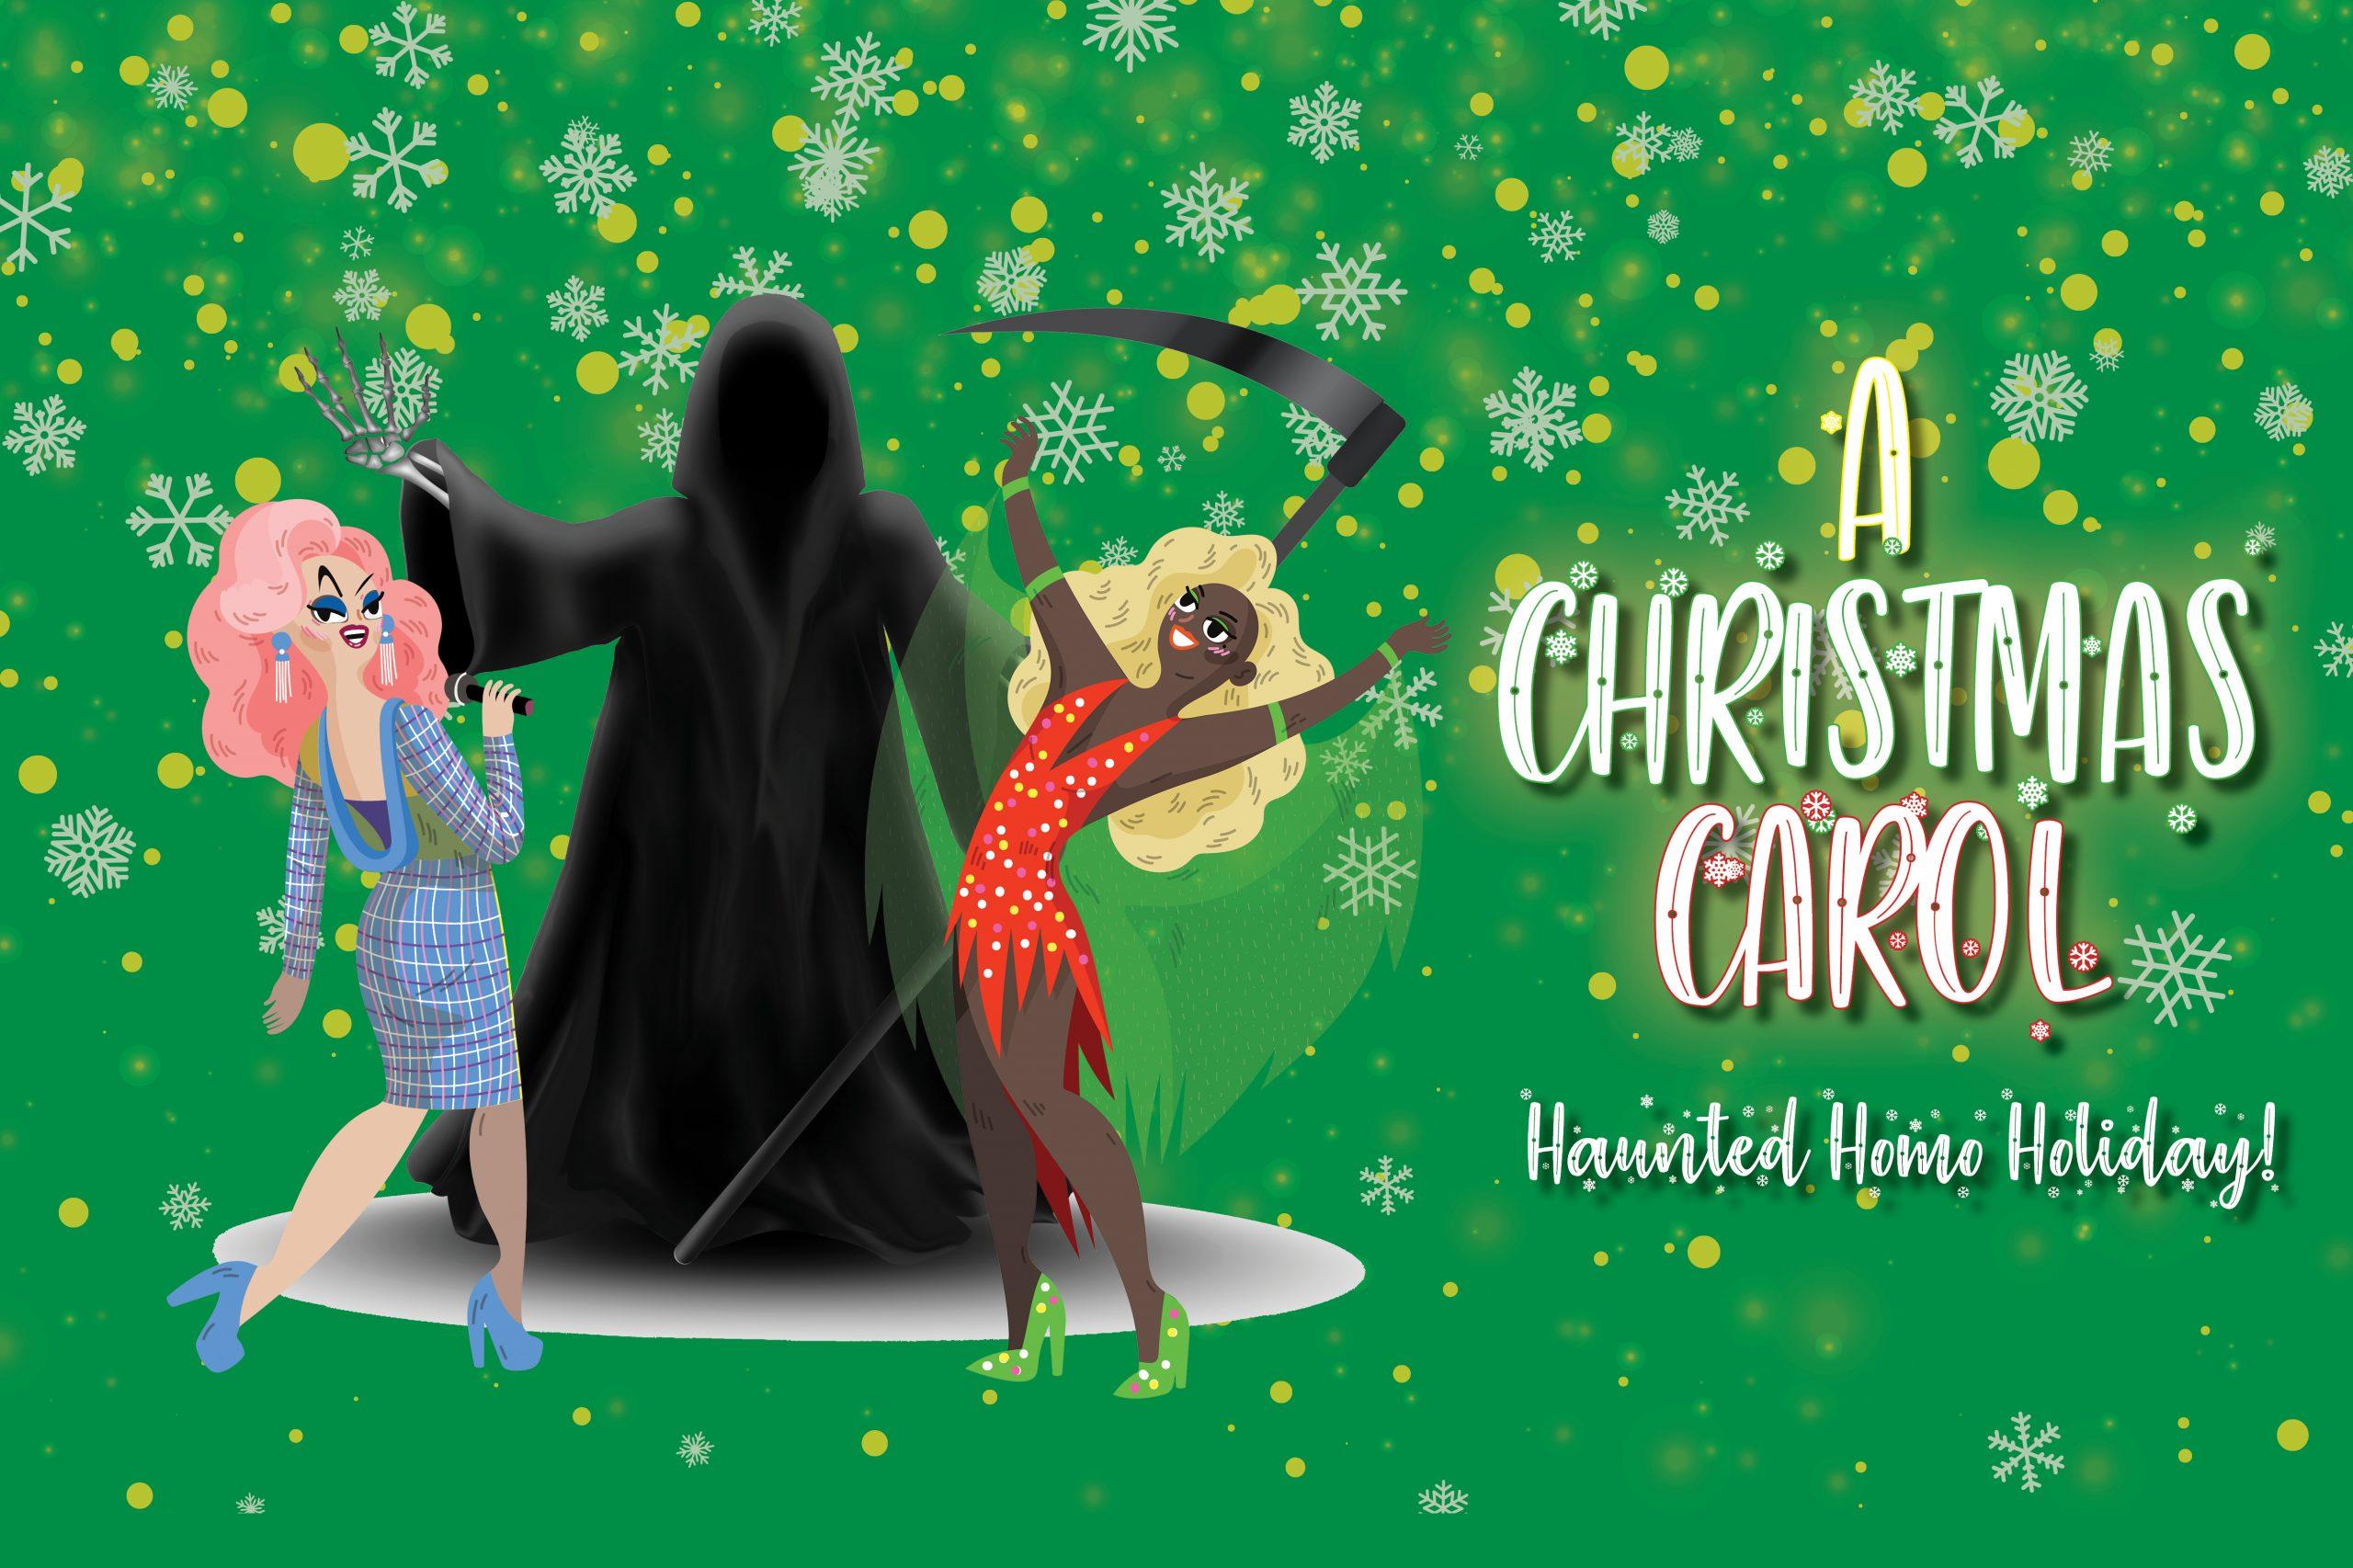 Chicago Gay Men S Chorus A Christmas Carol Haunted Homo Holiday Chicago Gay Men S Chorus